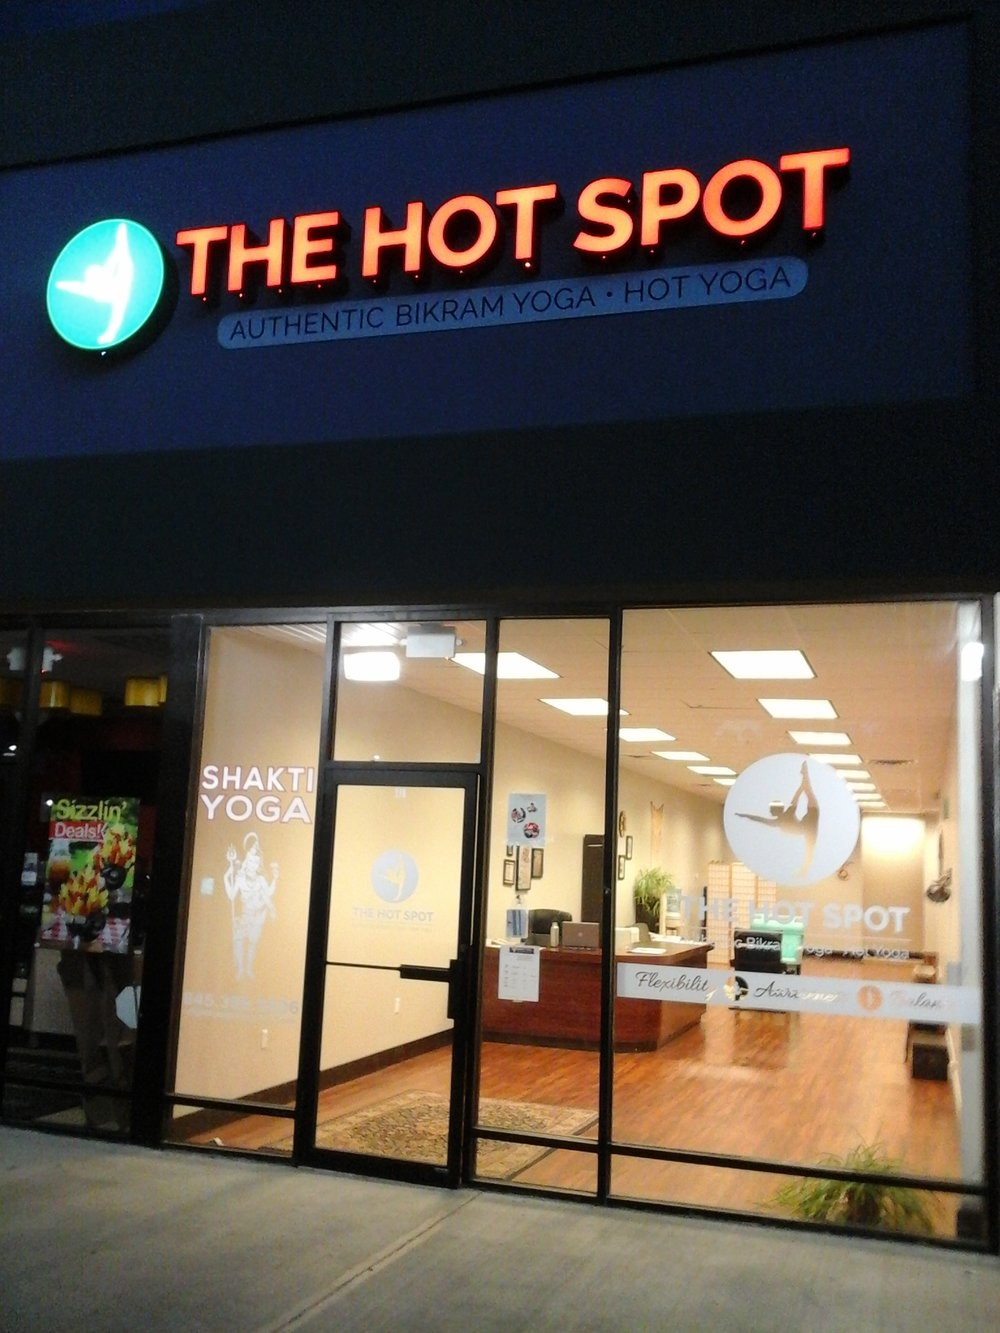 the hot spot sign night.jpg